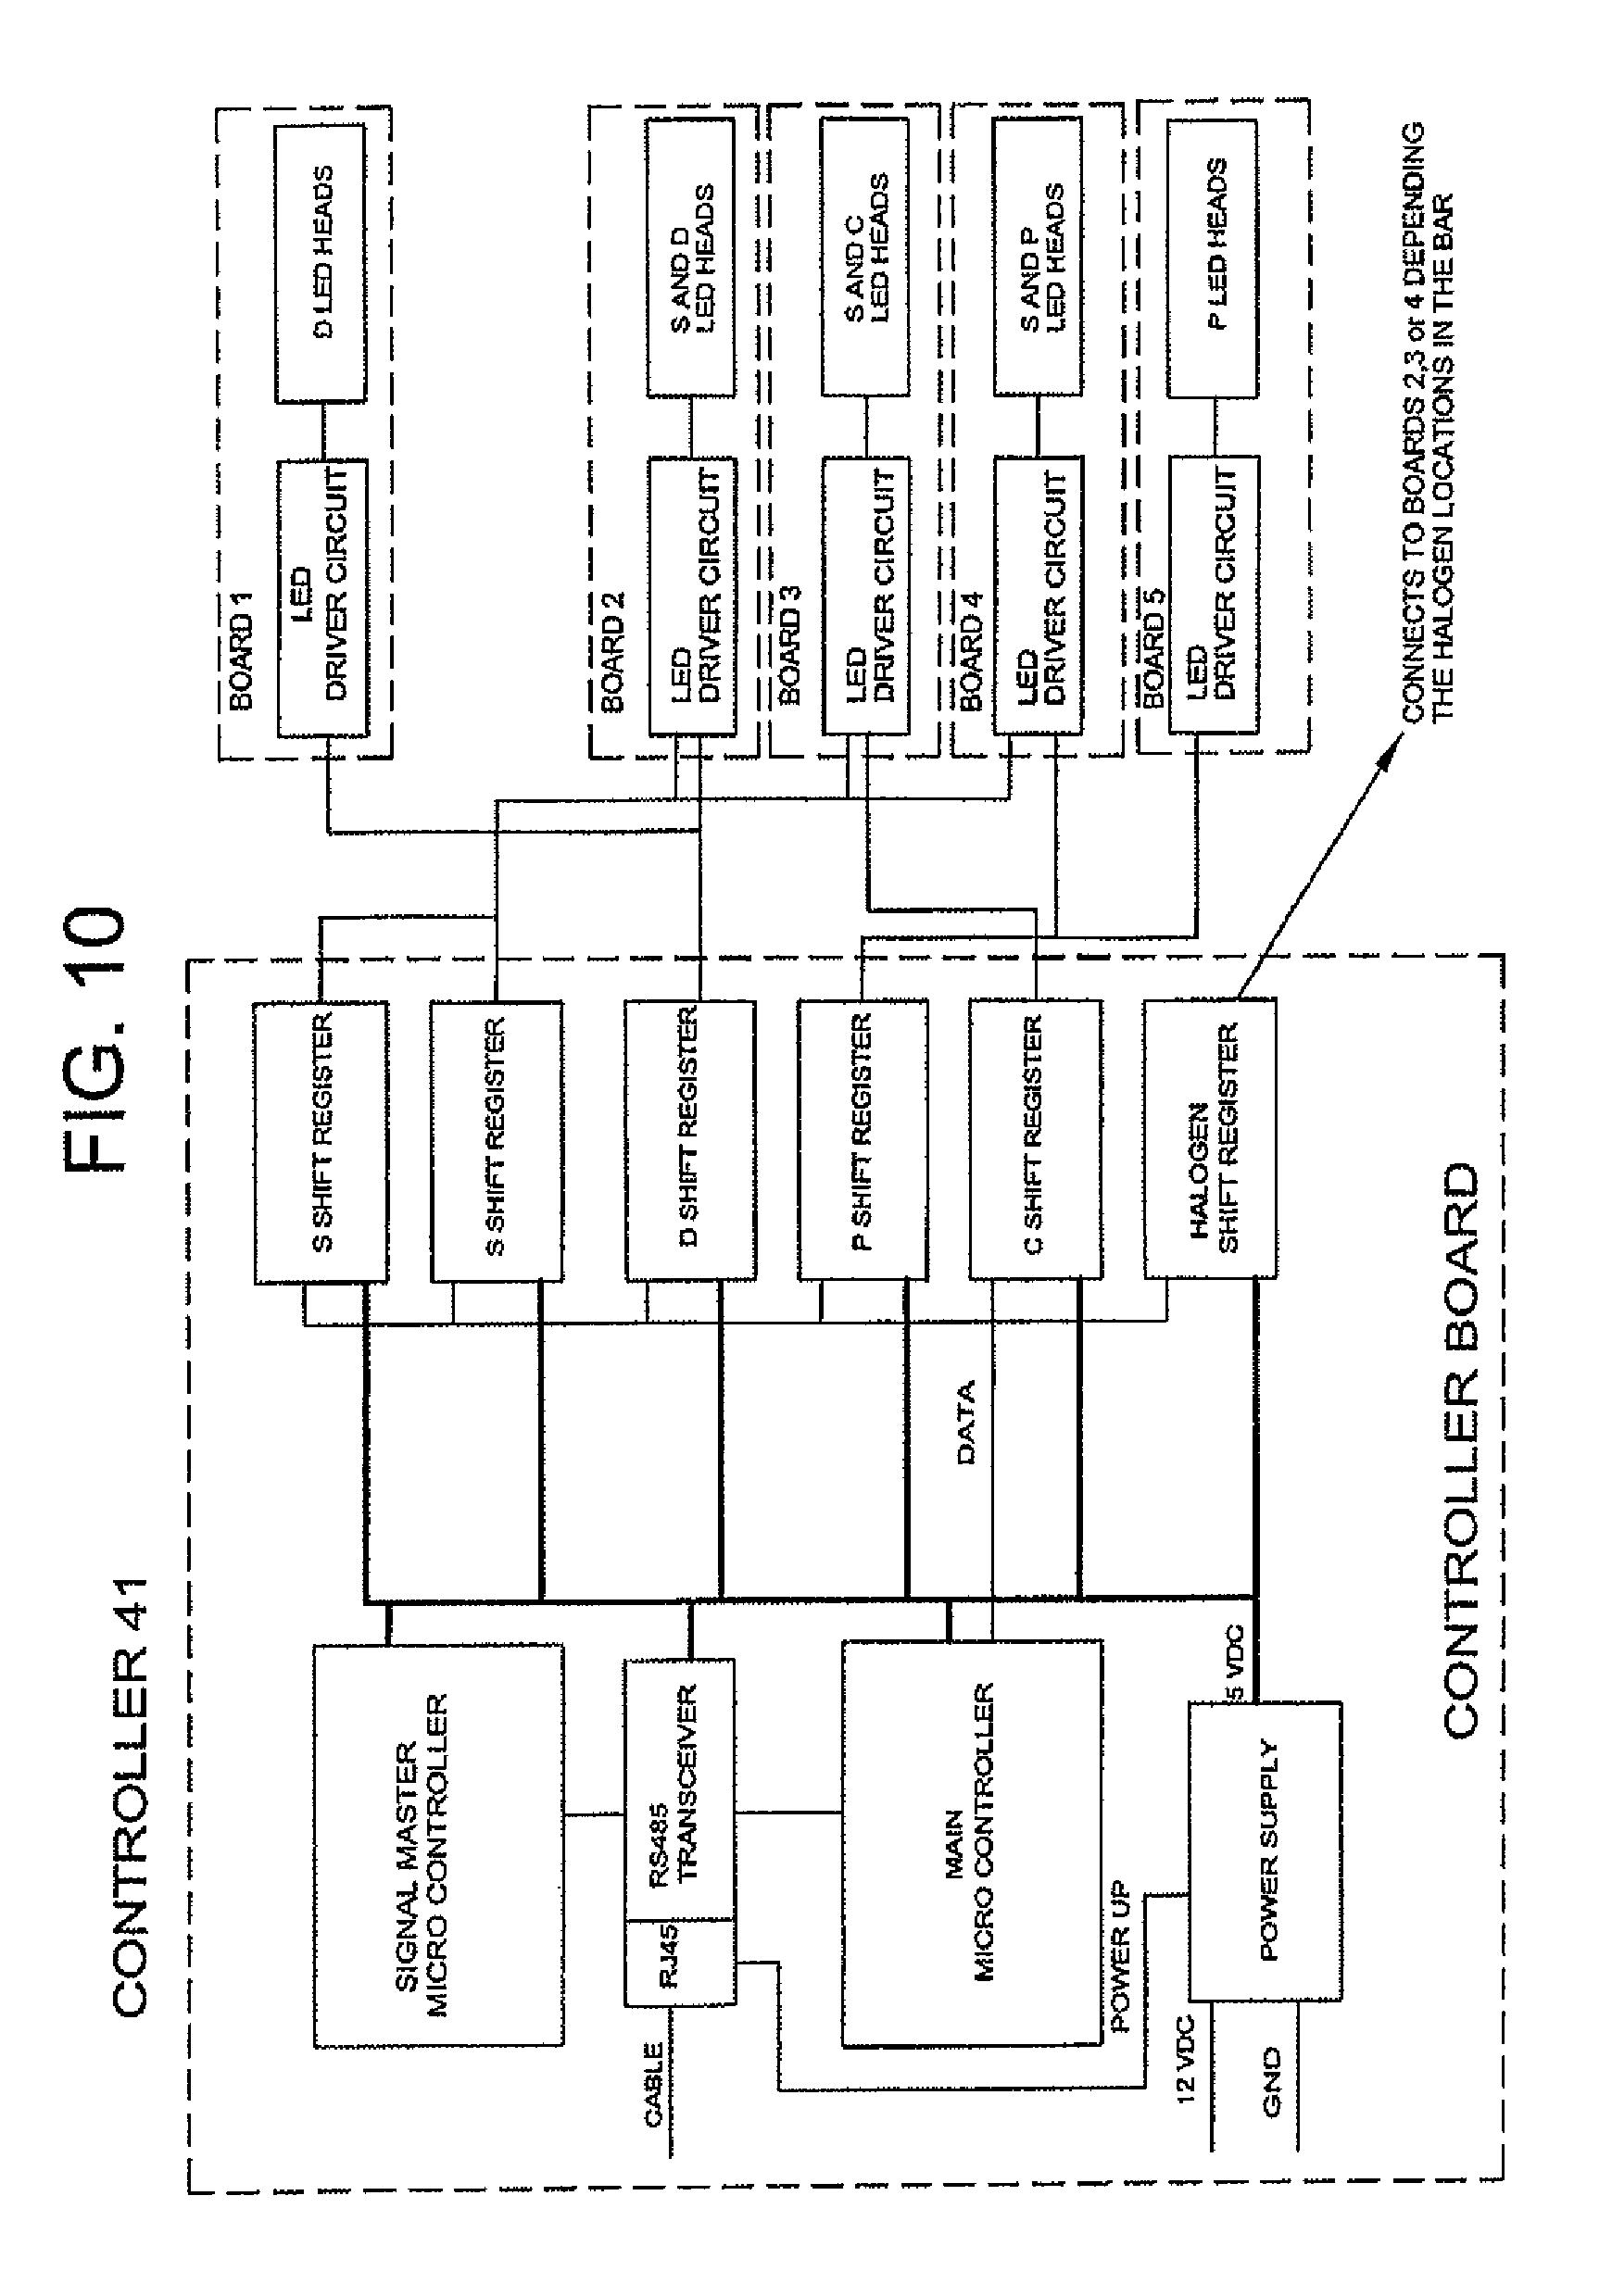 hight resolution of federal signal light bar wiring diagram wiring diagram expertsfederal signal light bar wiring diagram wiring diagram